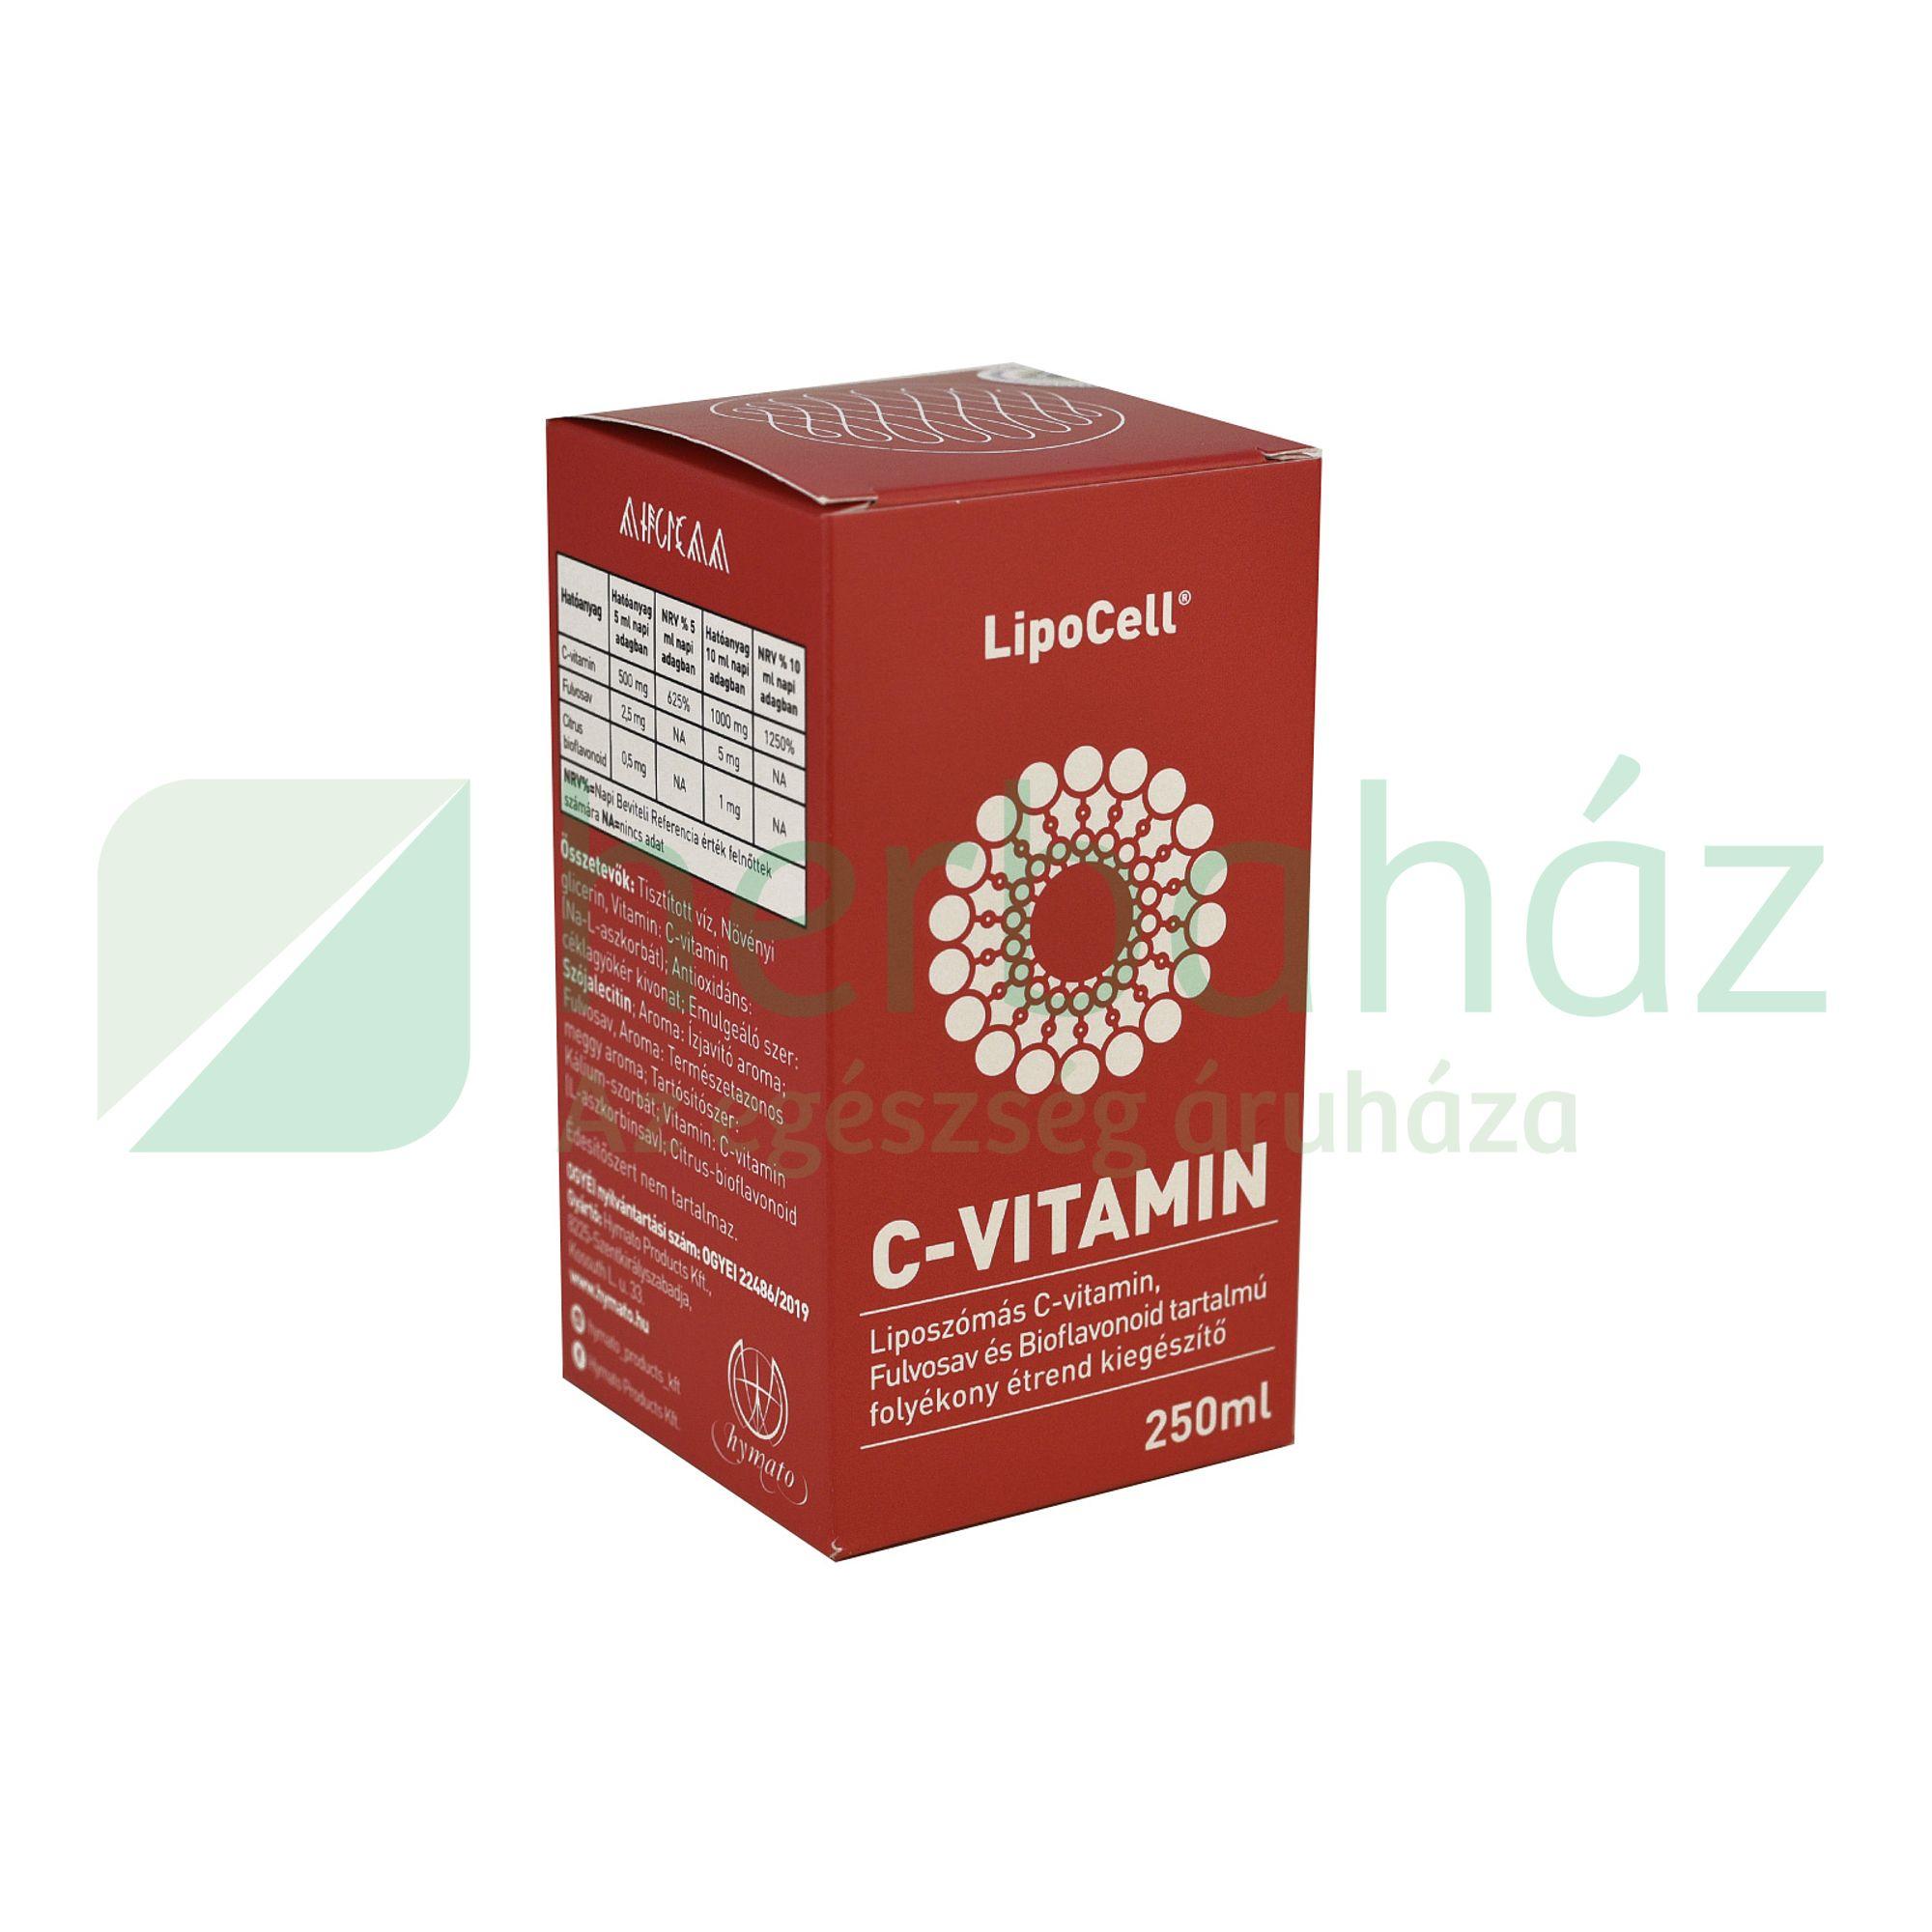 LIPOCELL C-VITAMIN 250ML